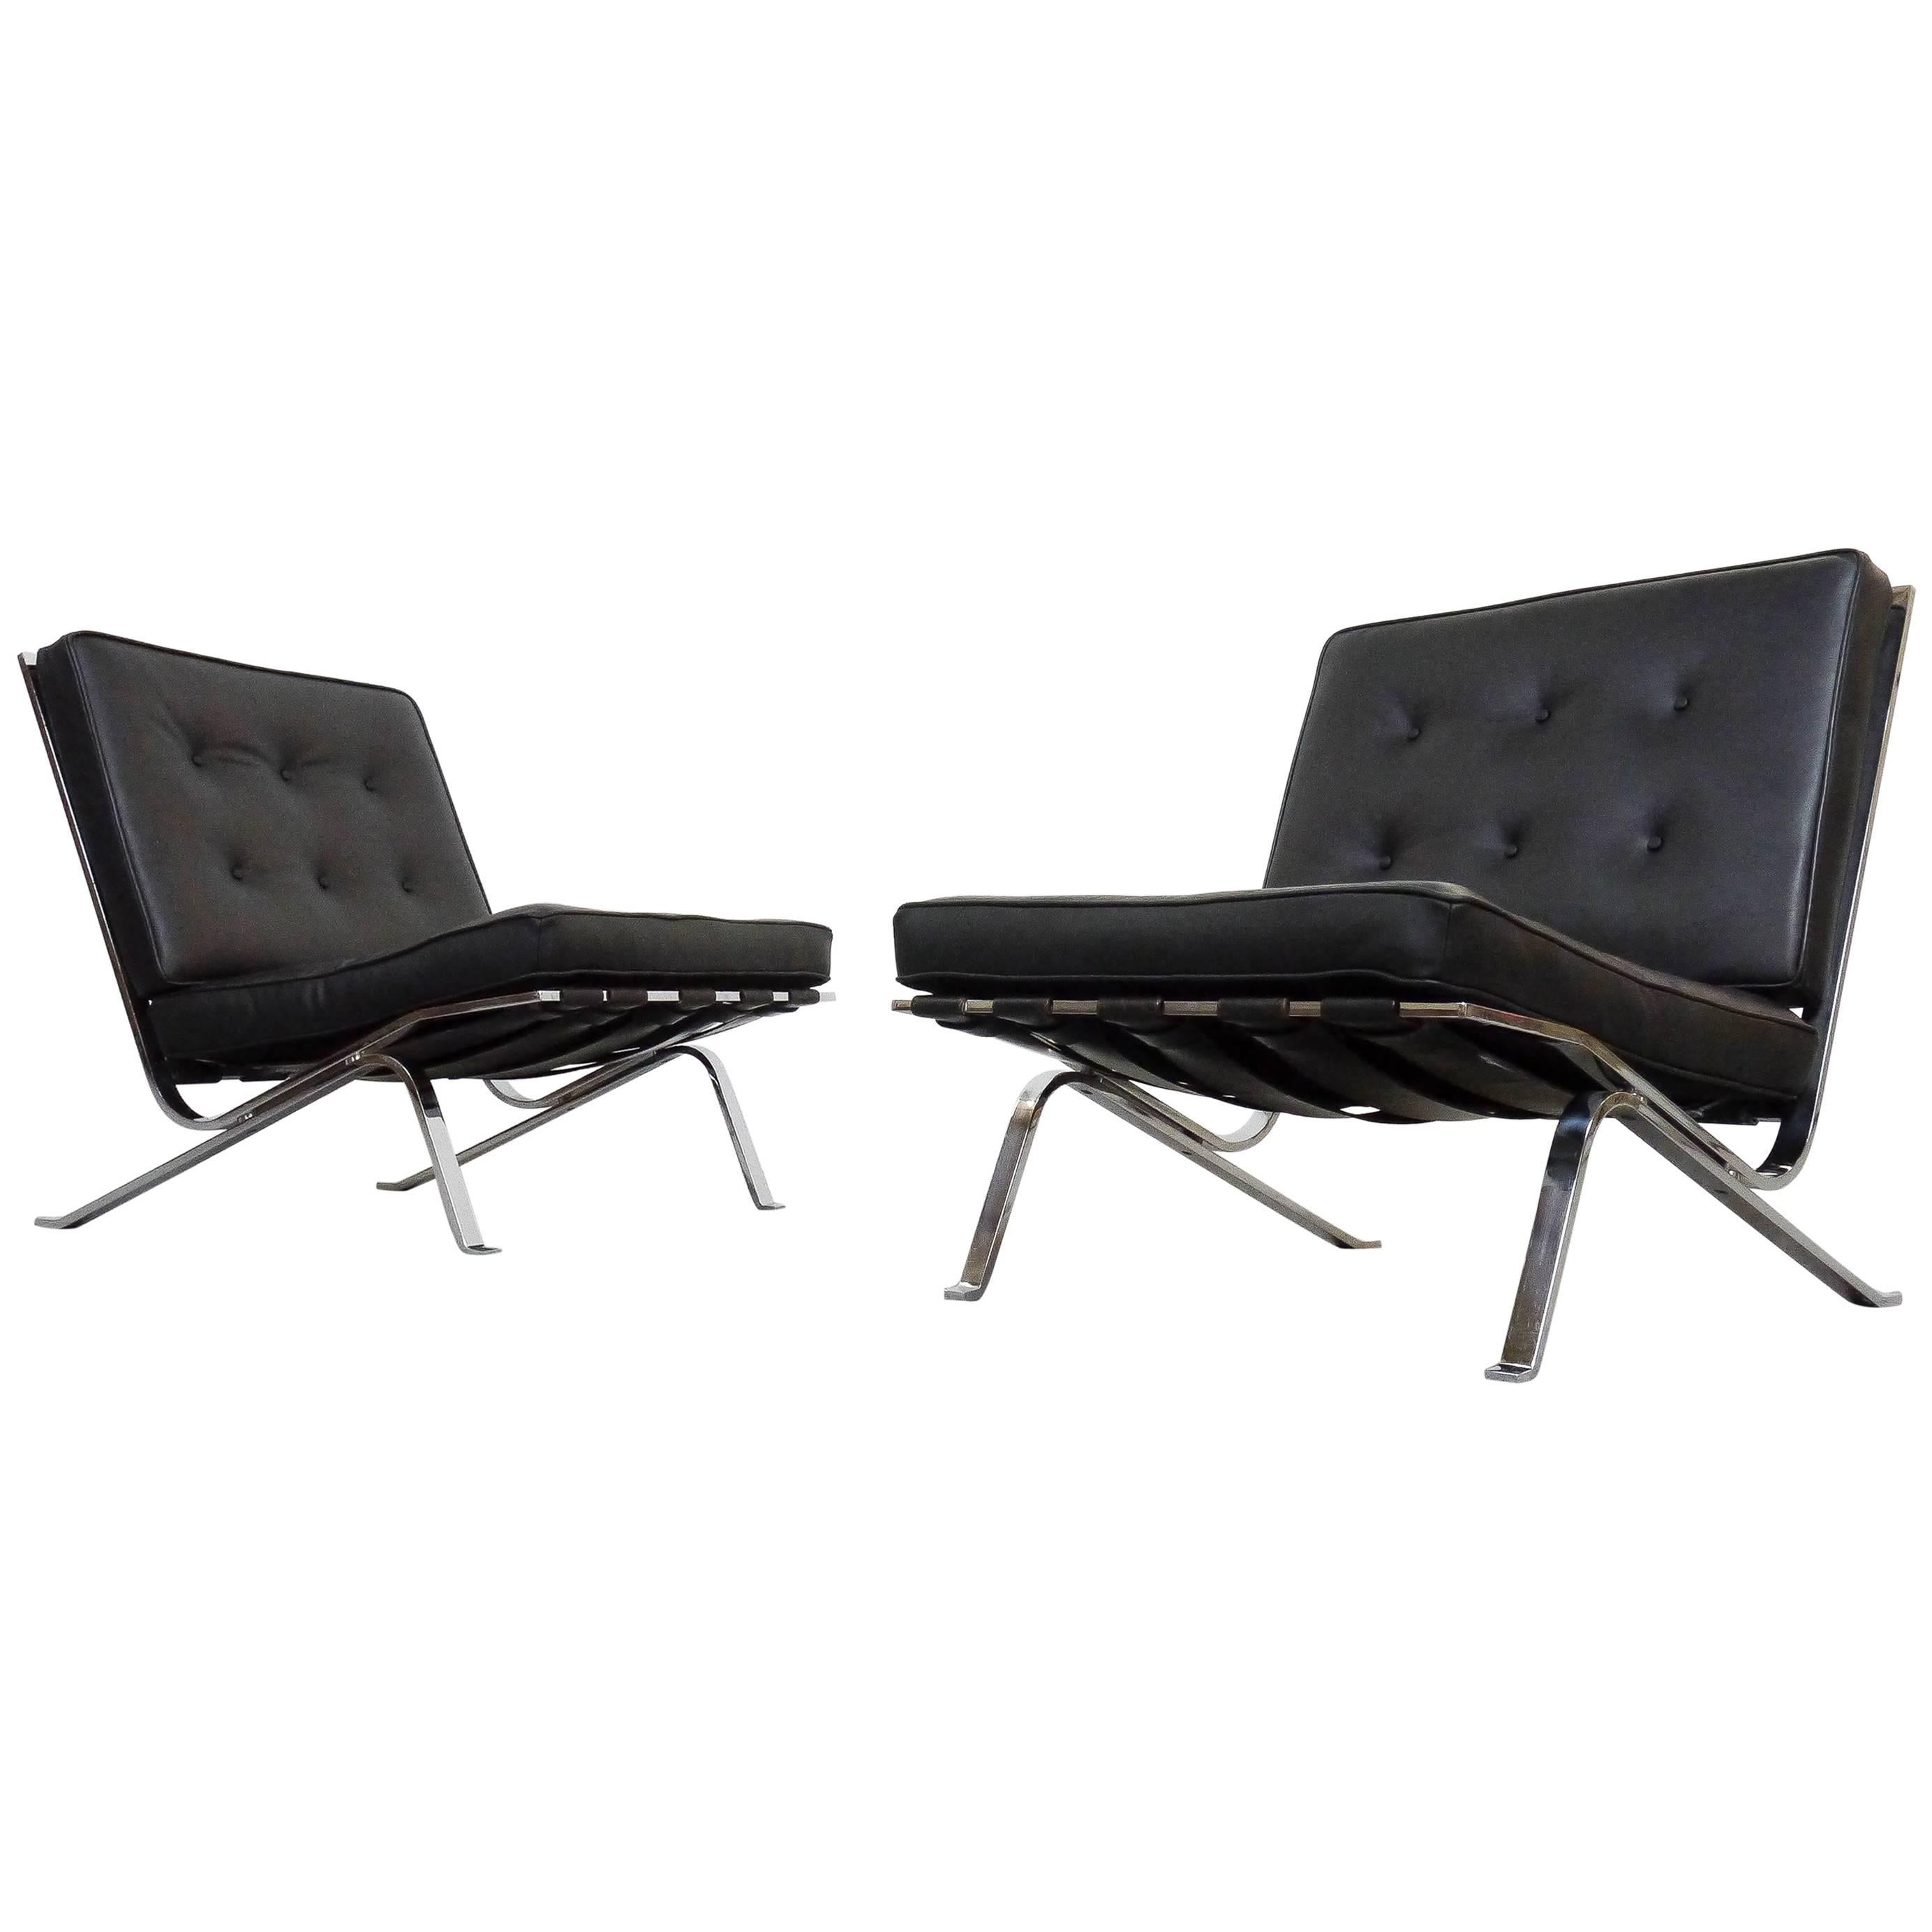 Pair Of RH 301 Flat Bar Lounge Chairs In Black Leather Robert Haussmann. De